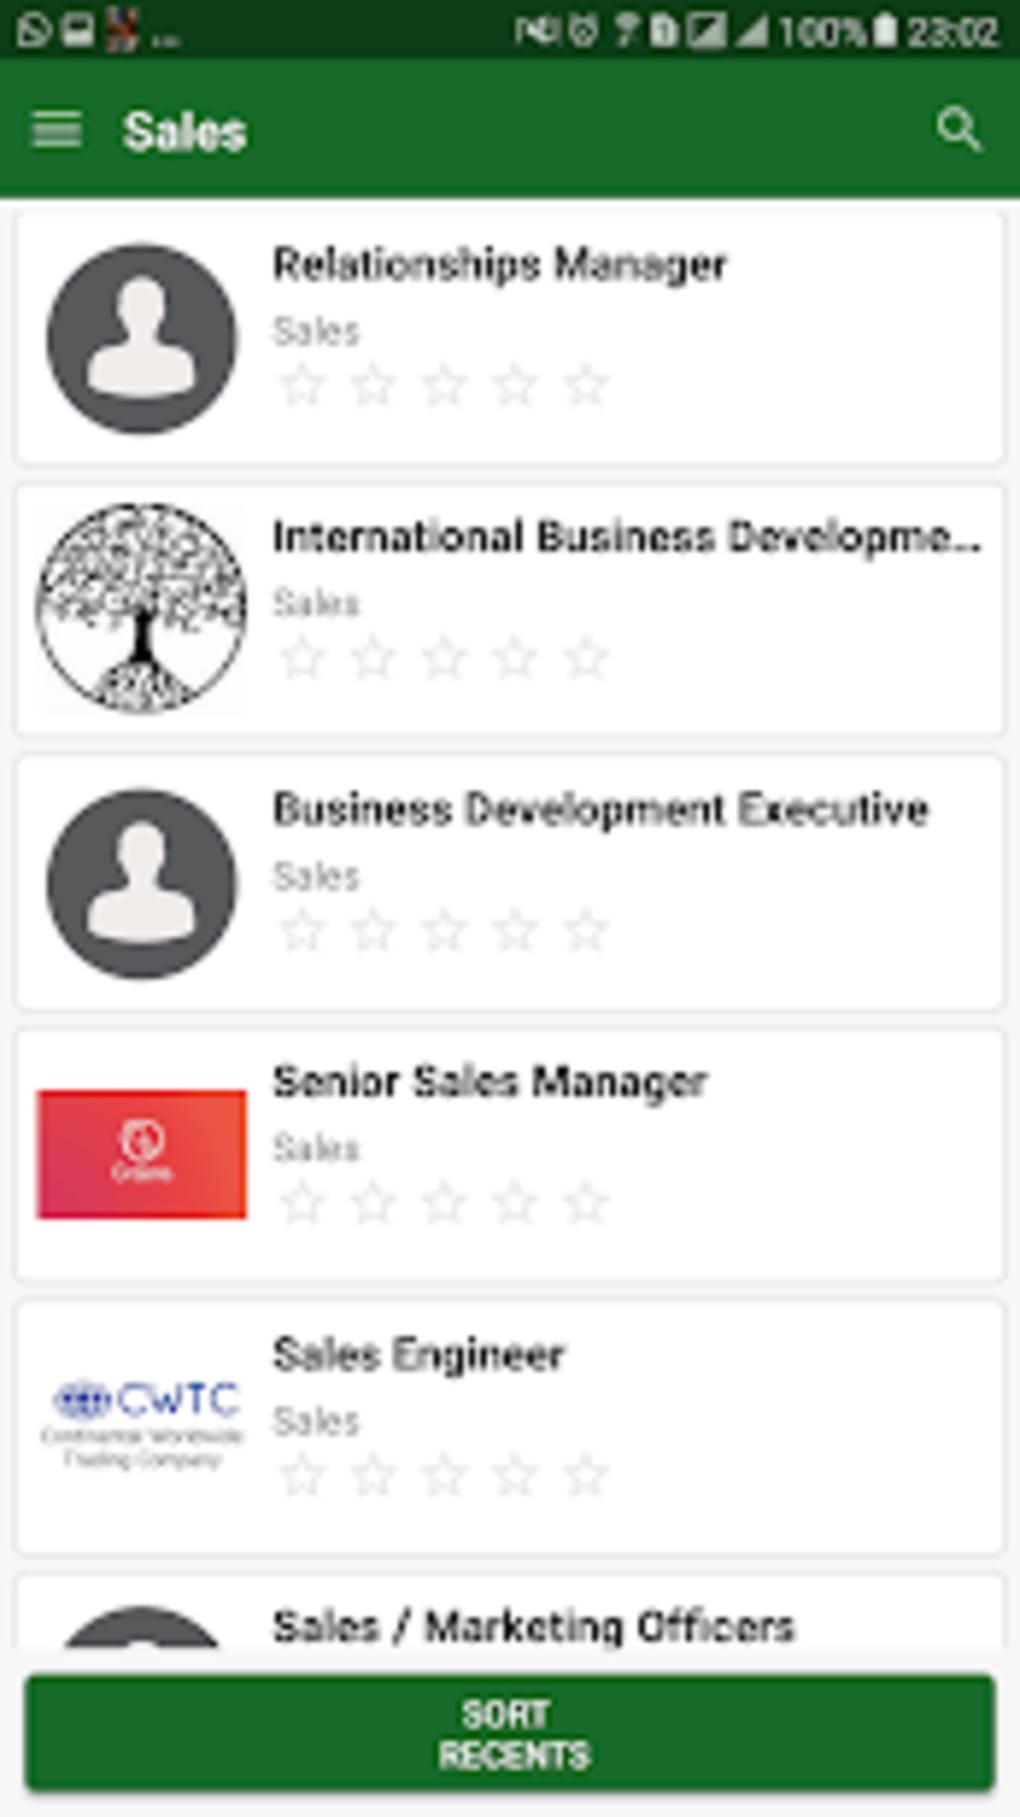 Online Jobs in Pakistan - Karachi for Android - Download